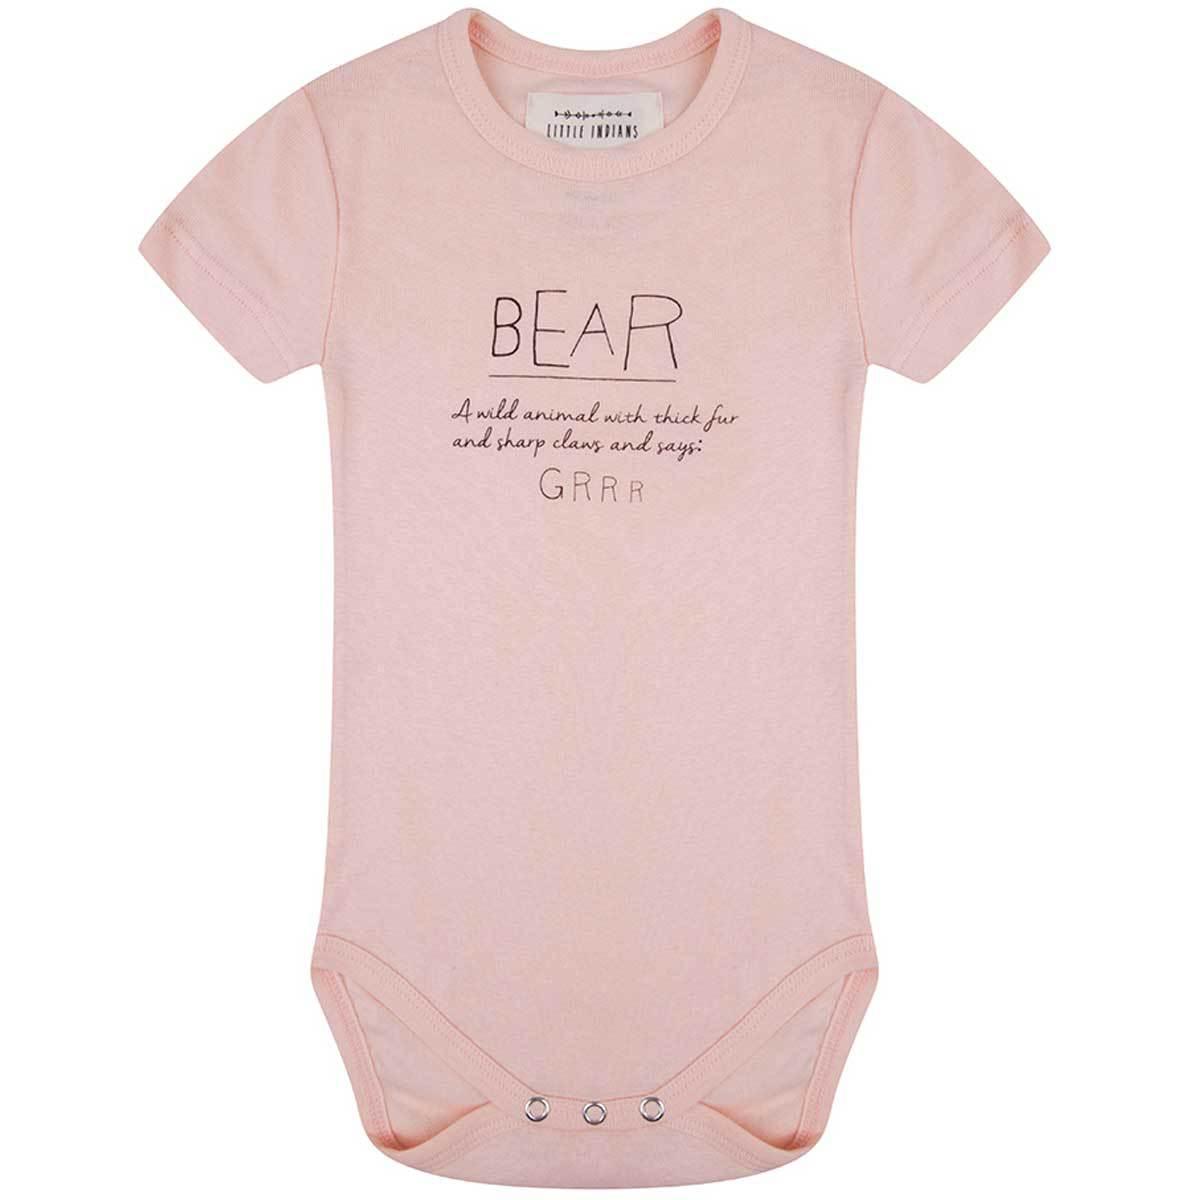 Body et Pyjama Body Bear - Shallop Shell - 3/6 mois Body Bear - Shallop Shell - 3/6 mois